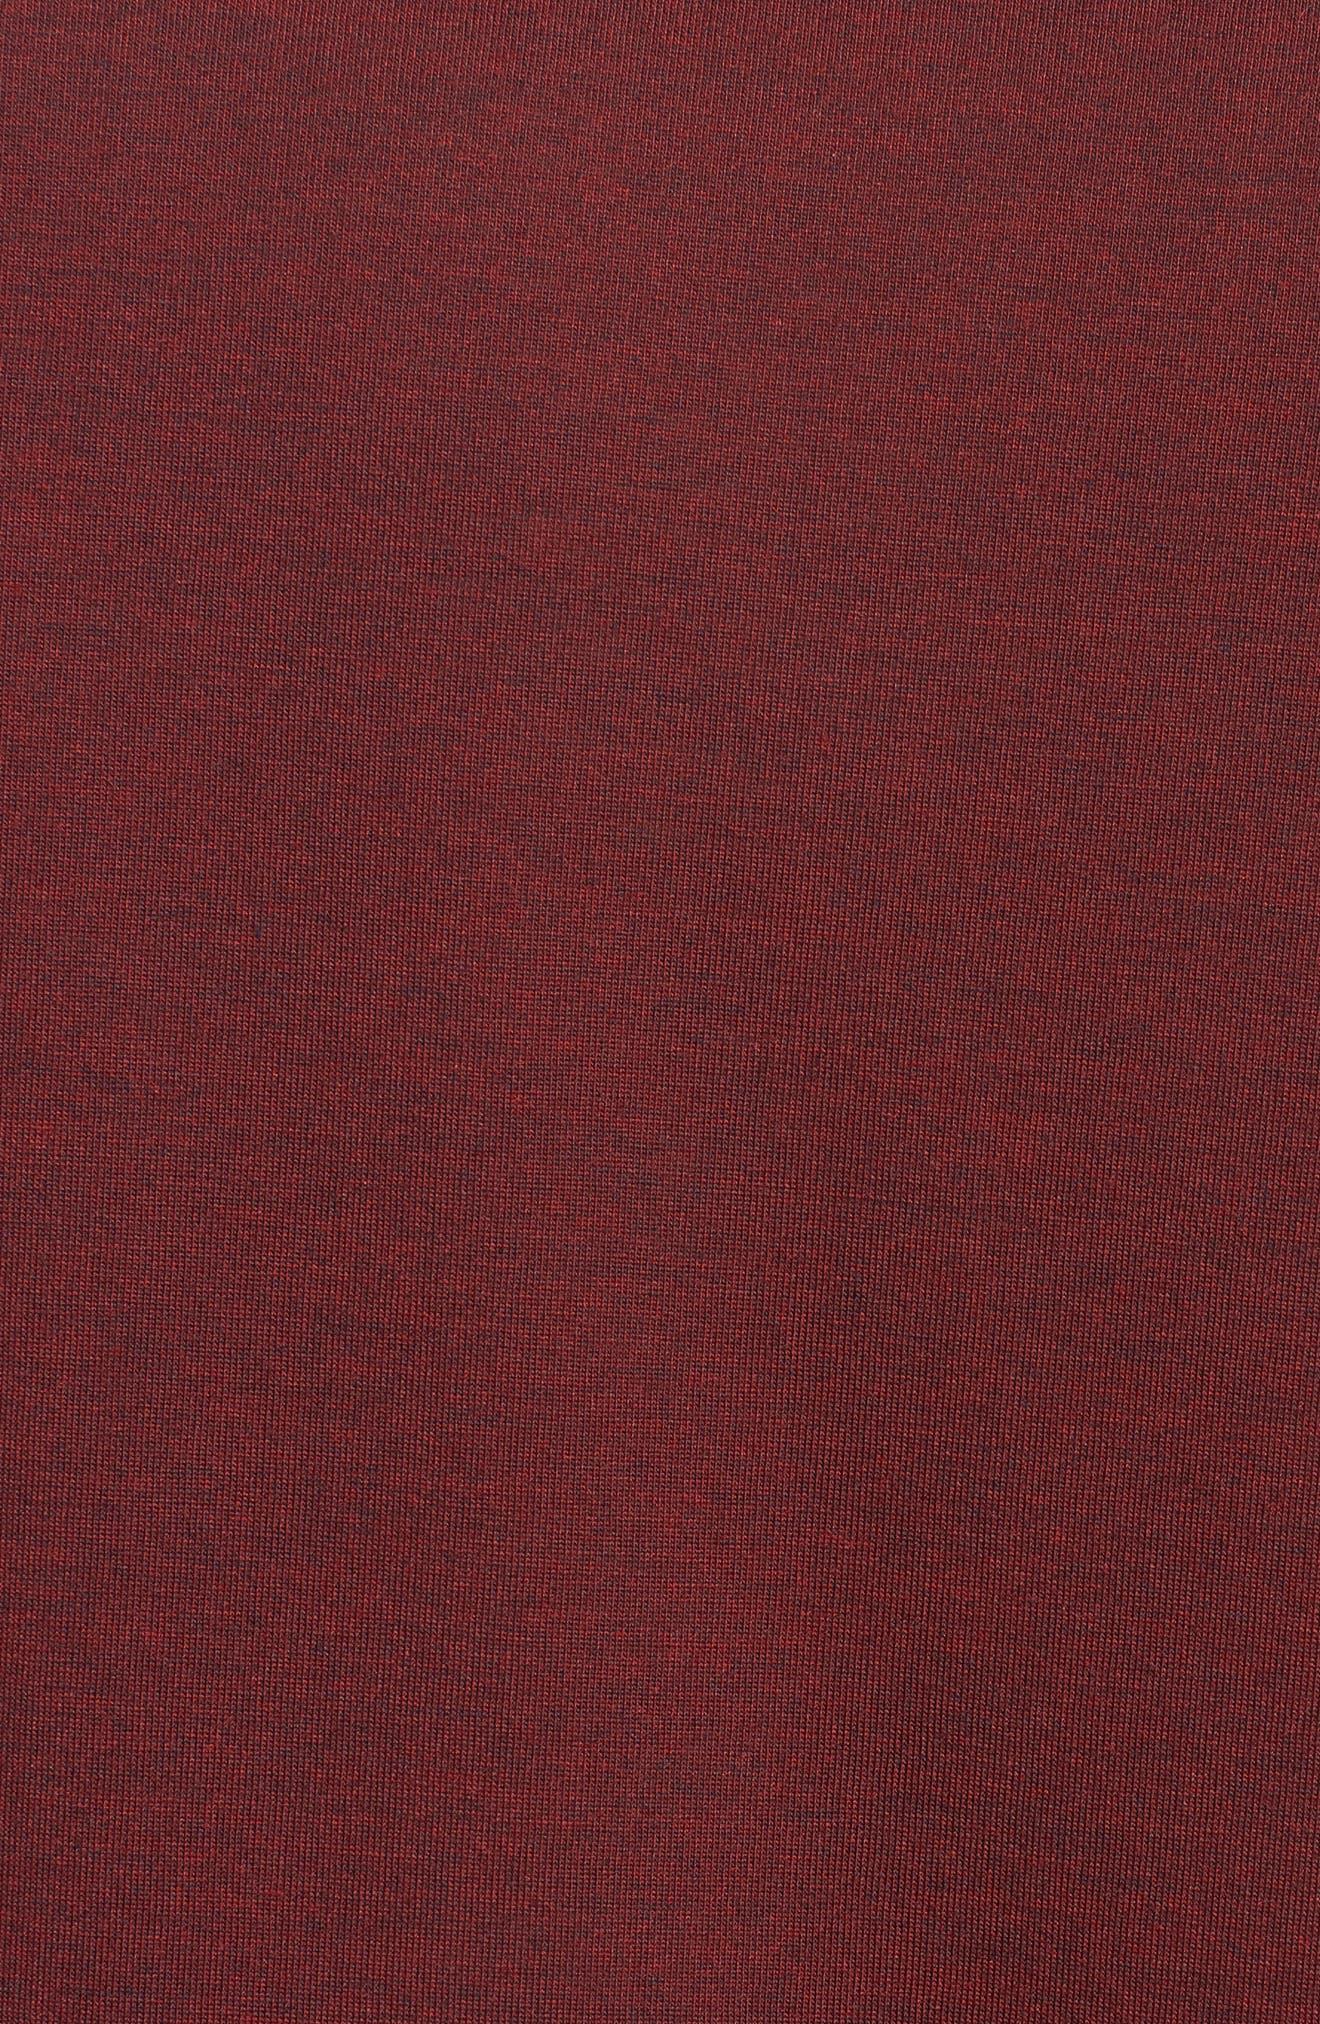 Alternate Image 5  - Under Armour Threadborne Siro 3C Twist T-Shirt